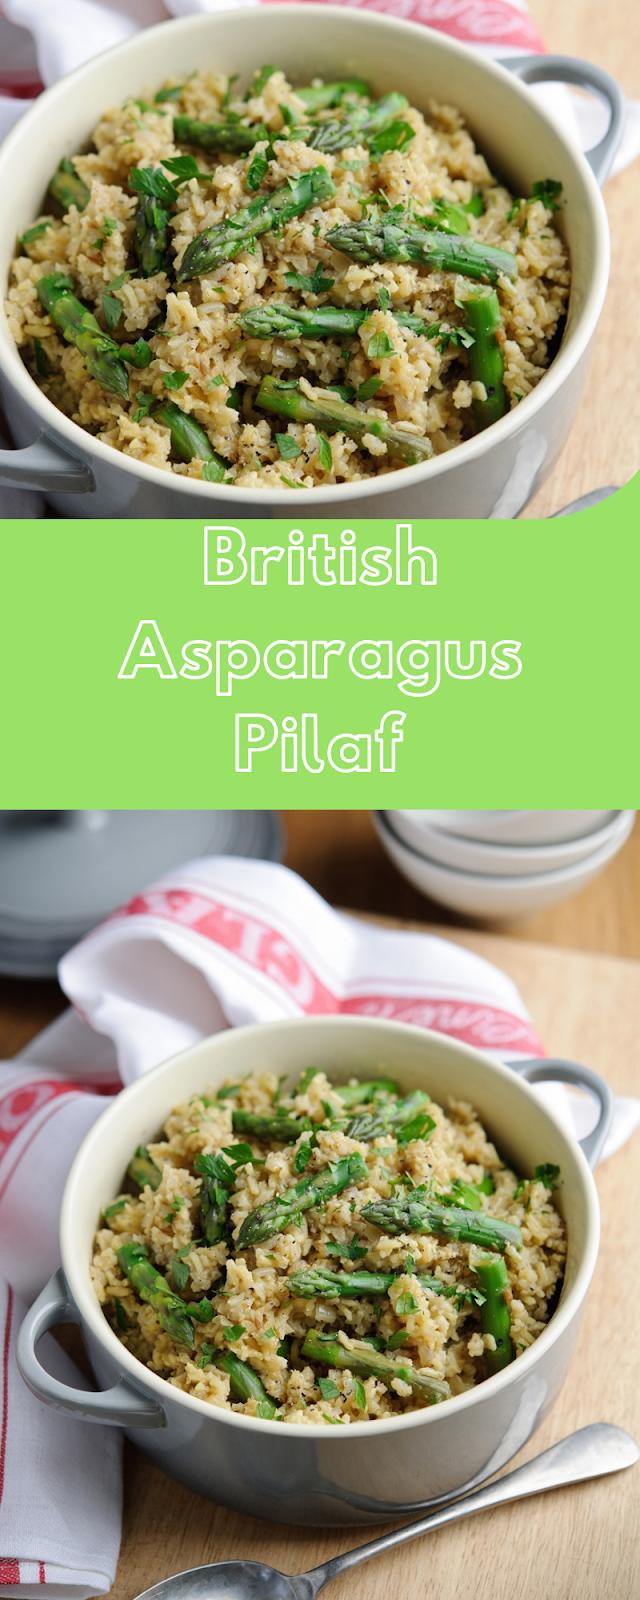 British Asparagus Pilaf